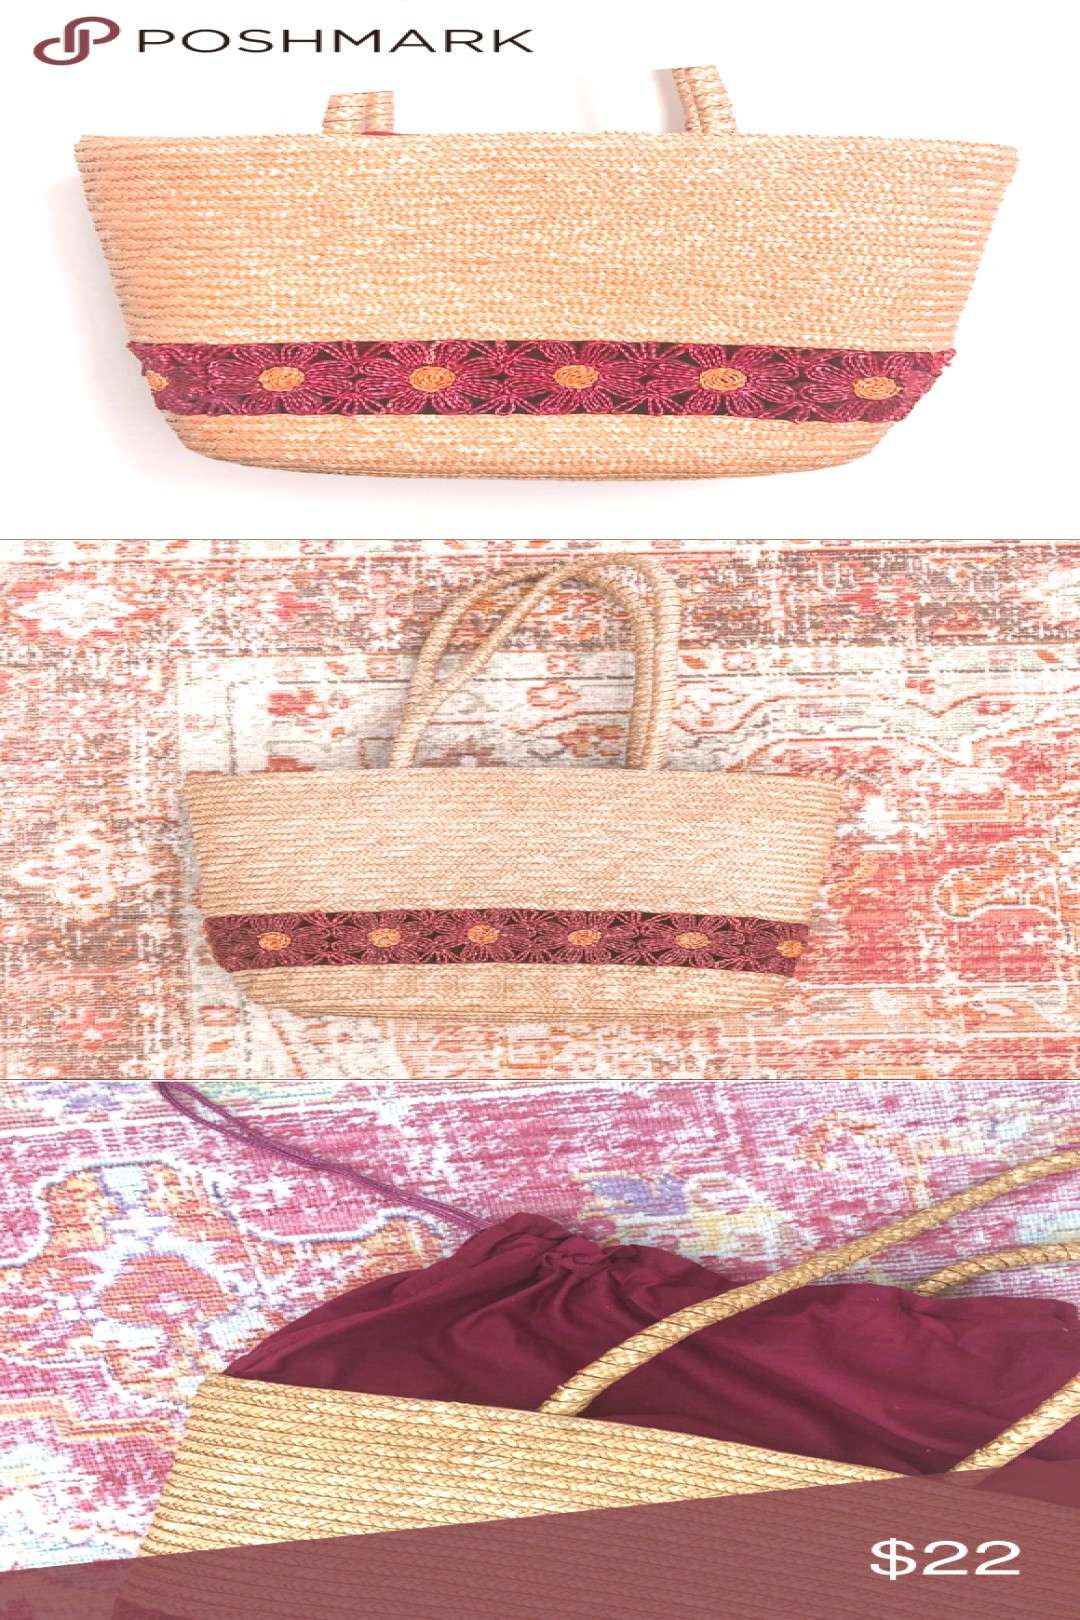 WOVEN WICKER FLORAL OVERSIZED TOTE BAG Pretty oversized woven wicker tote bag p WOVEN